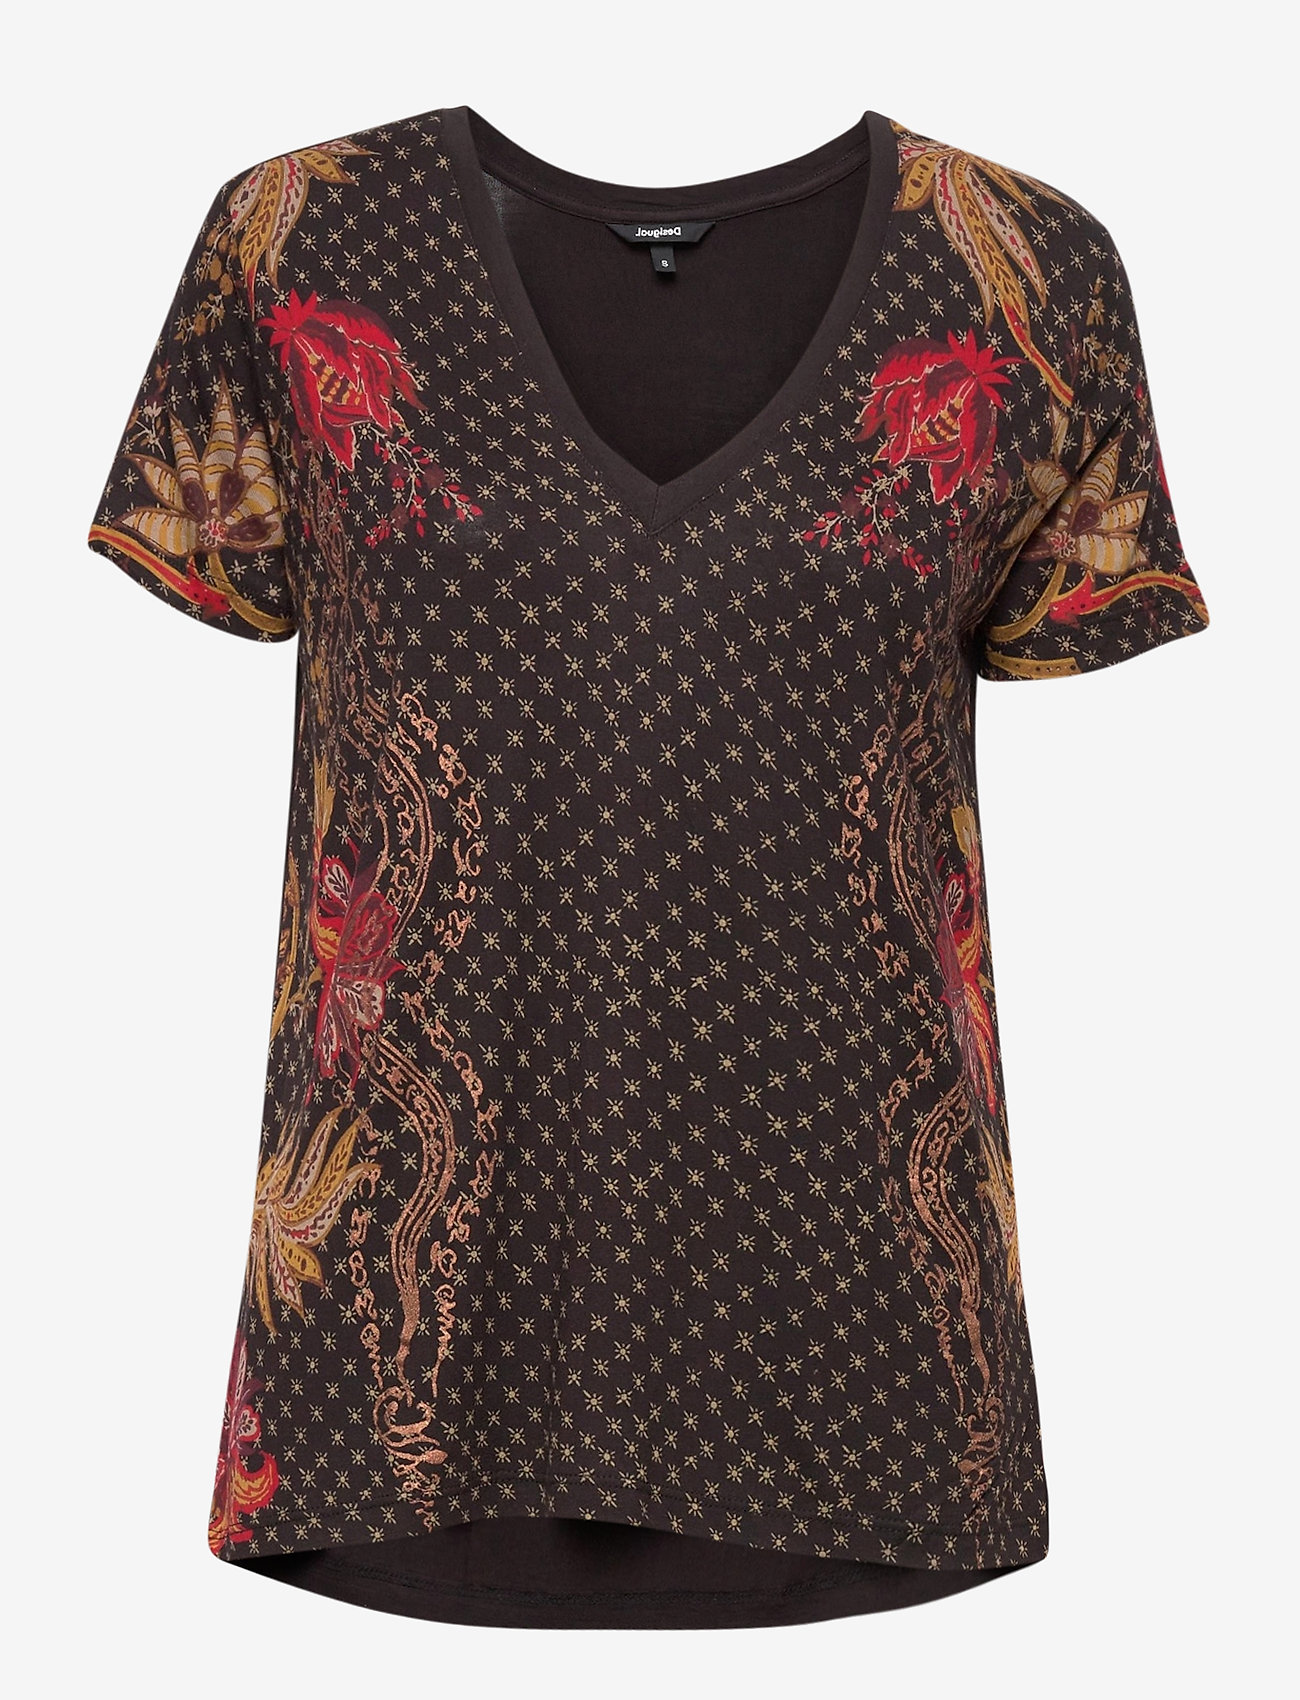 Desigual - TS PRAGA - t-shirts - negro - 0